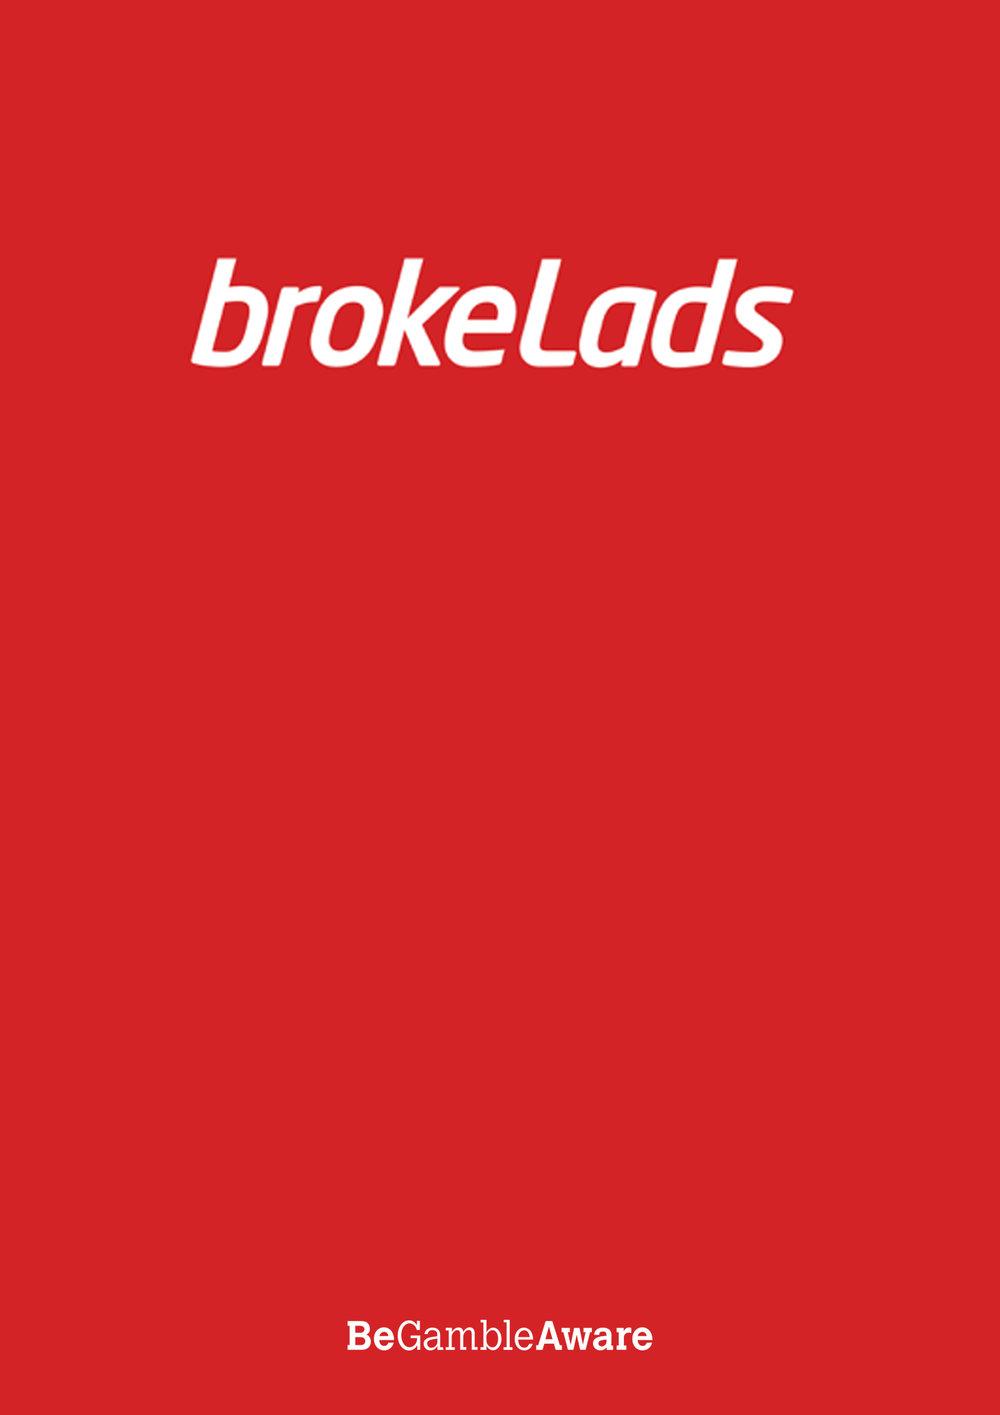 brokelads.jpg